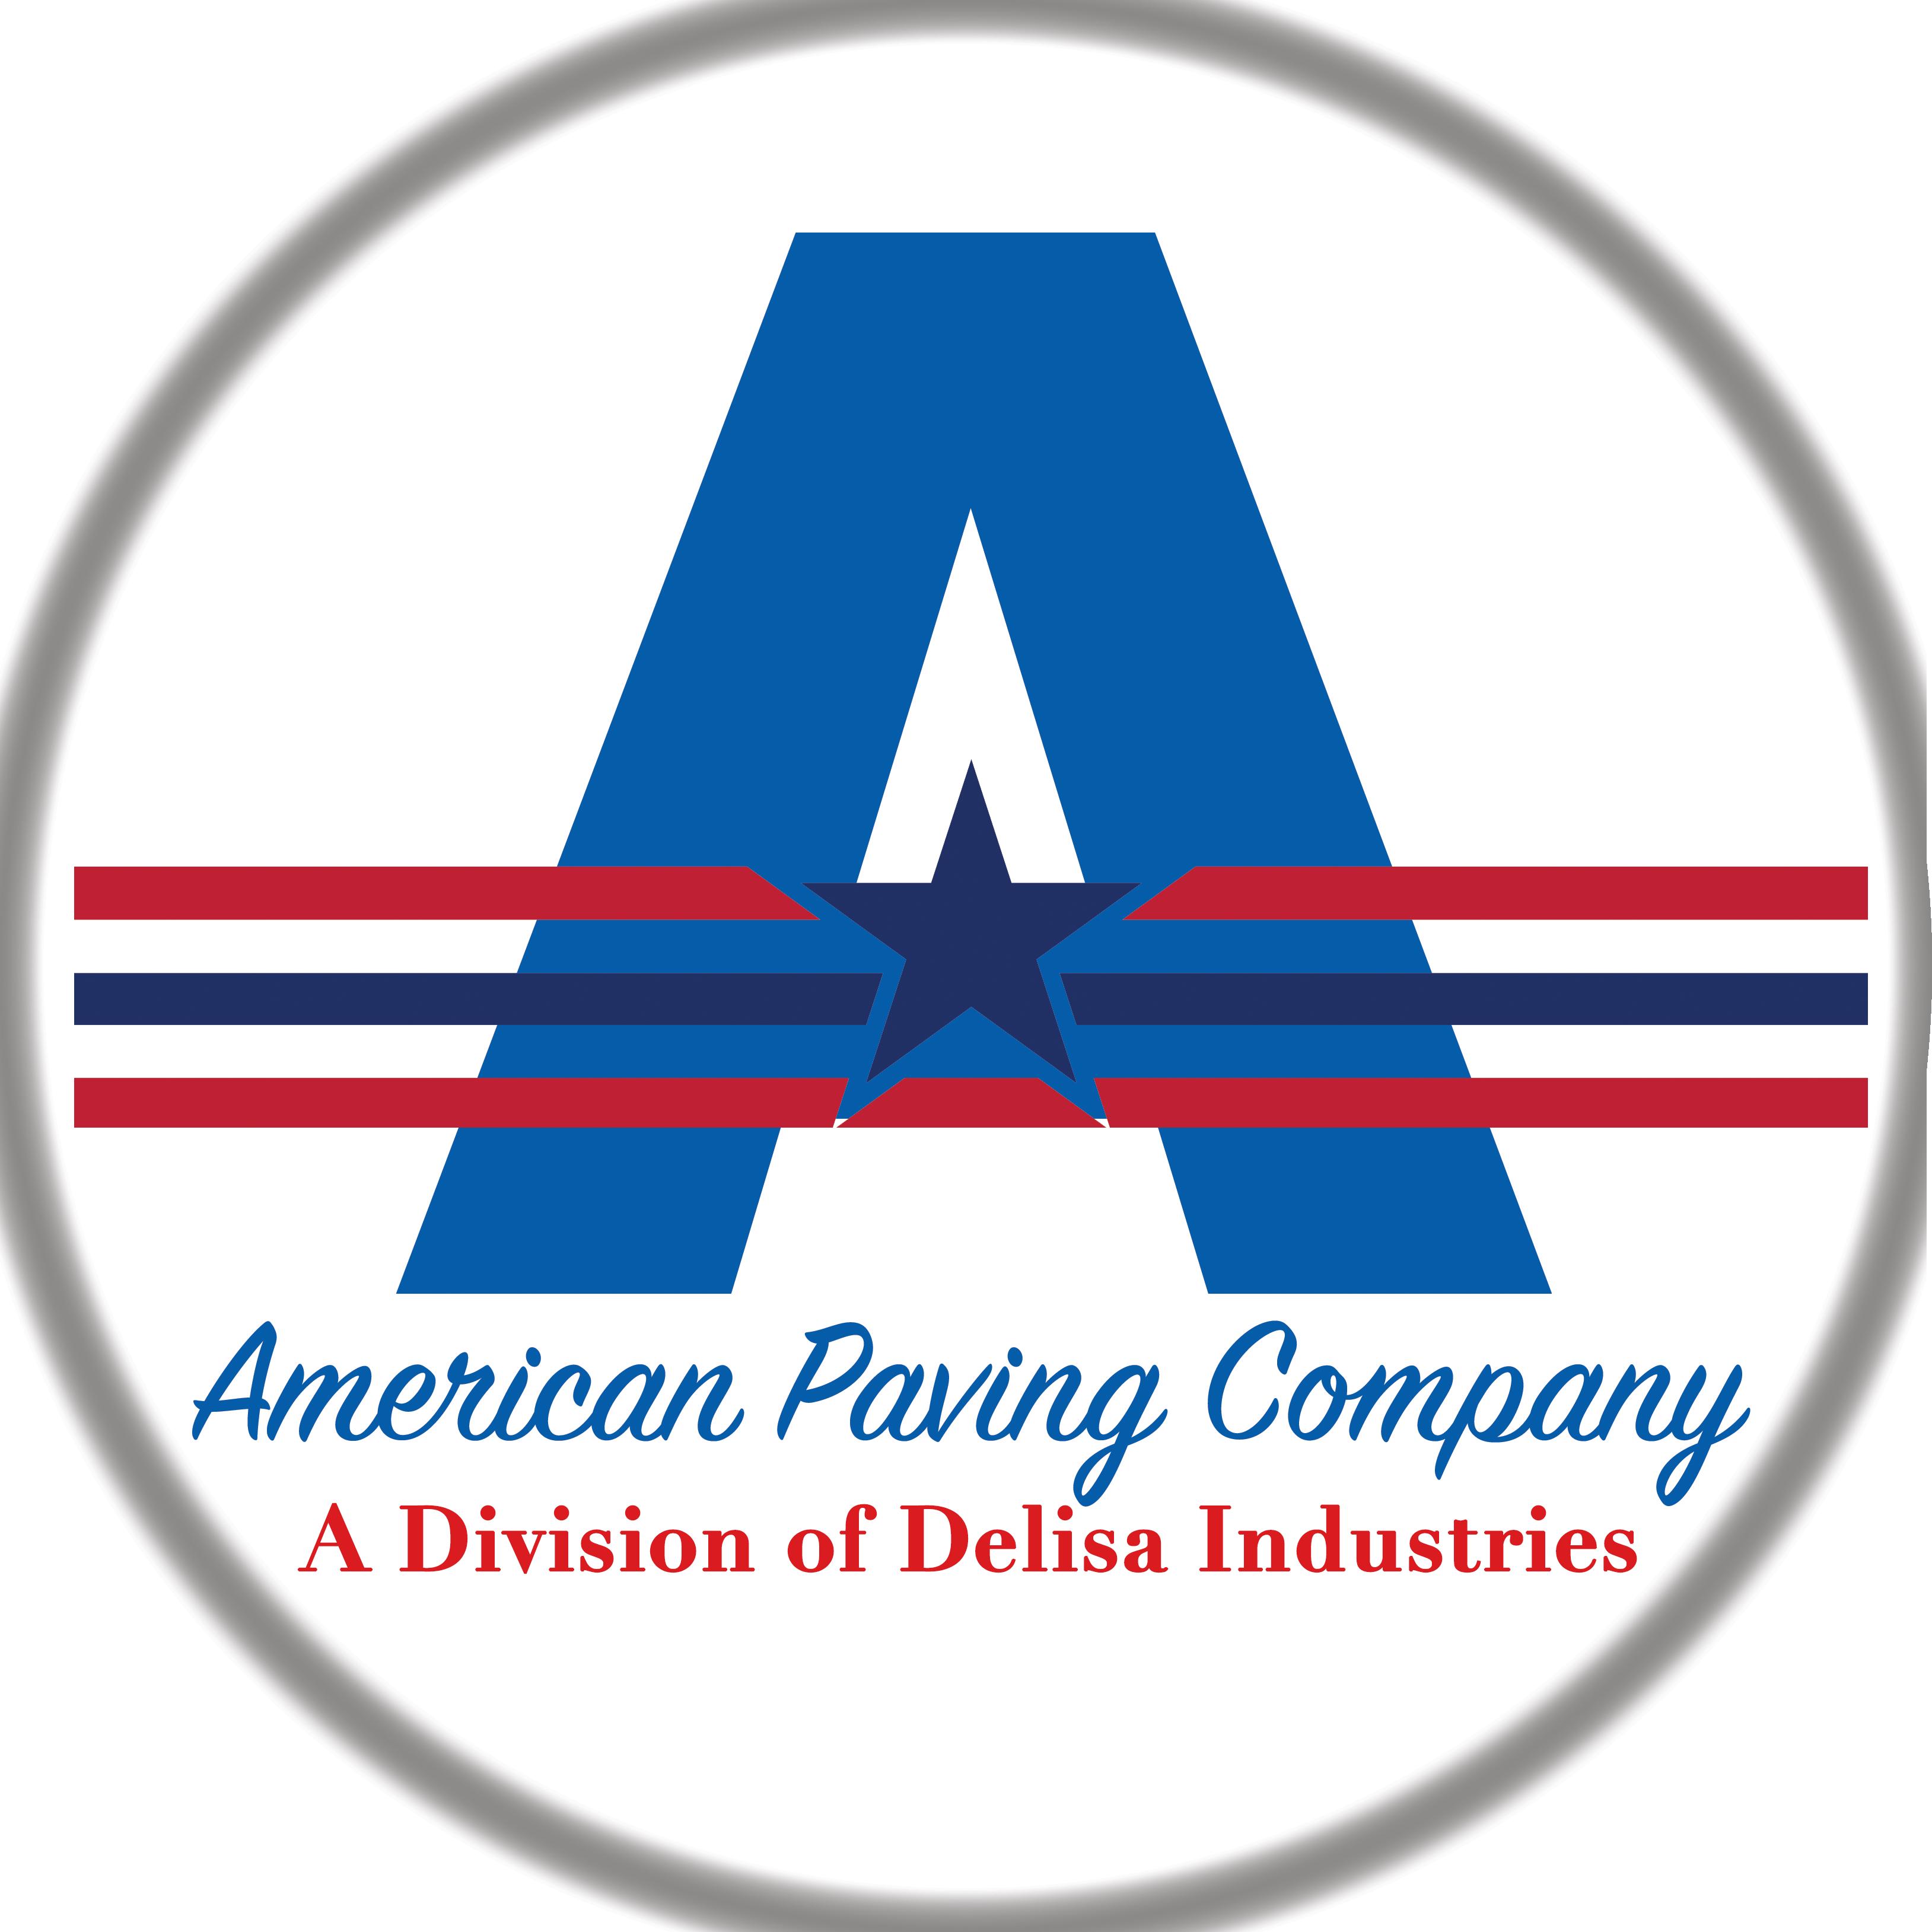 American Paving Company